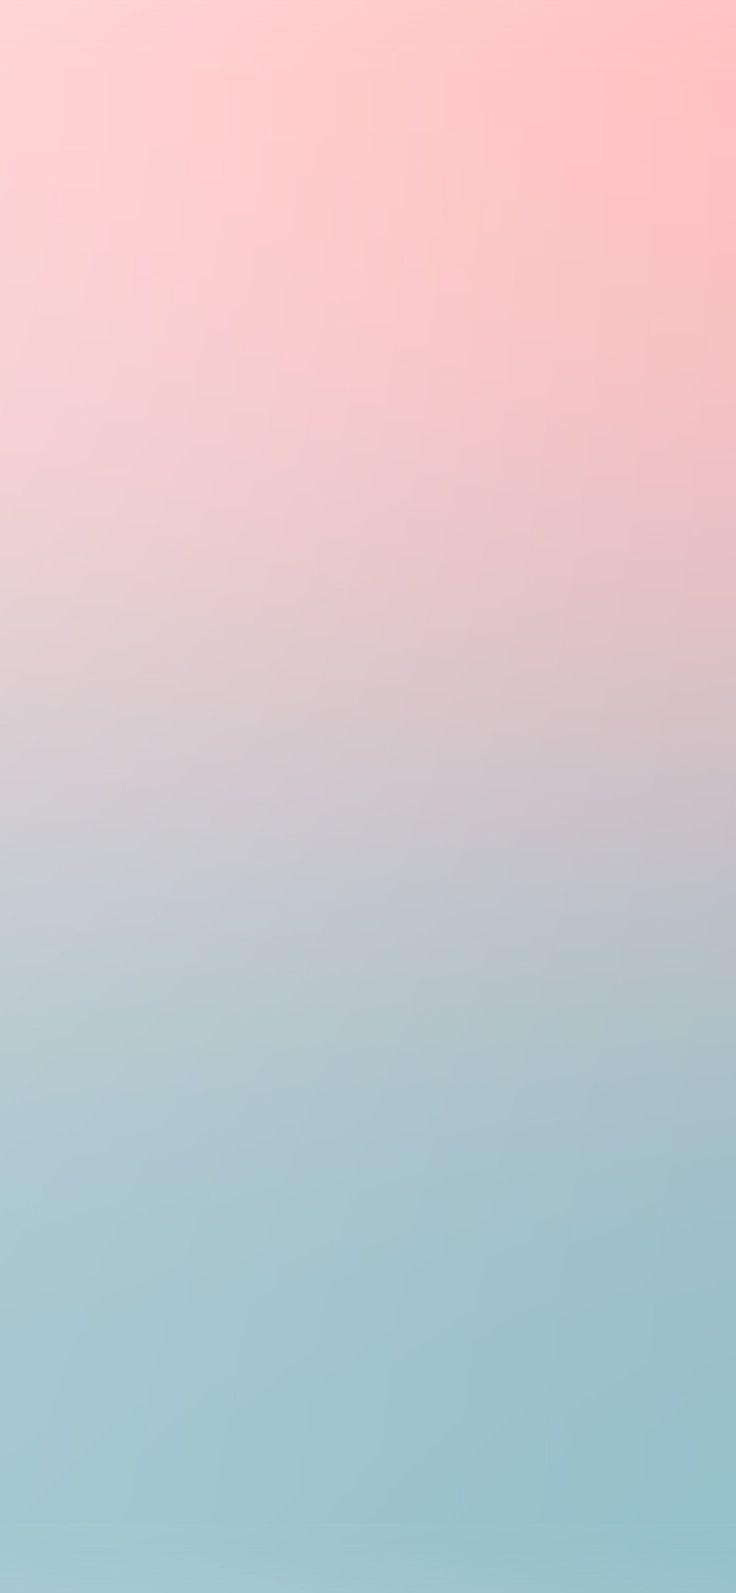 Iphonexpaperscom Apple Iphone Wallpaper Sm07 Pink Blue Soft